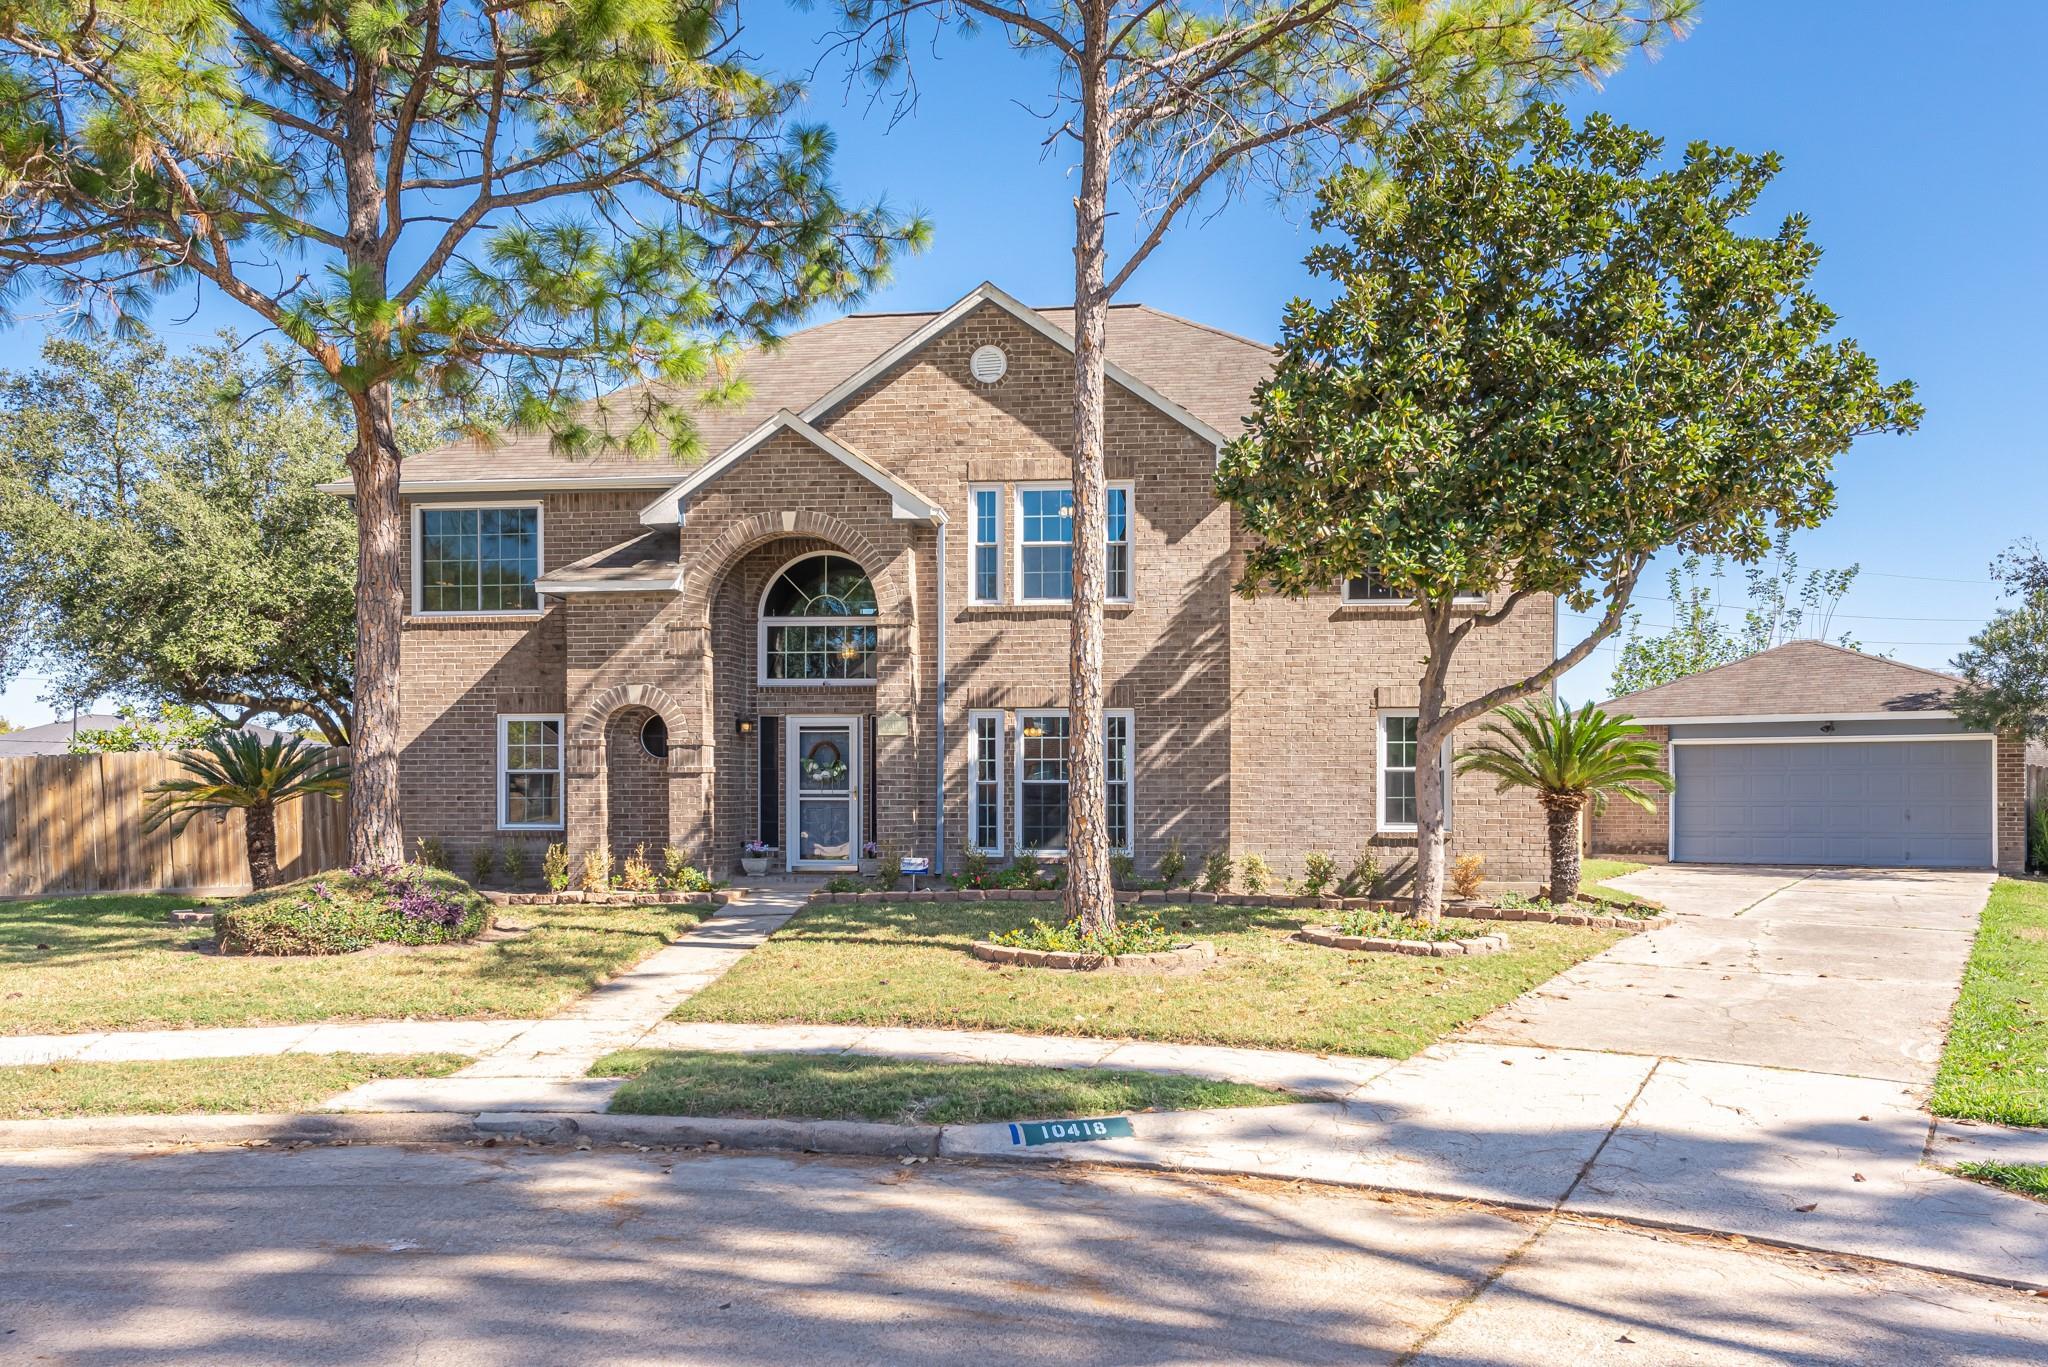 10418 Springland Court Property Photo - Houston, TX real estate listing